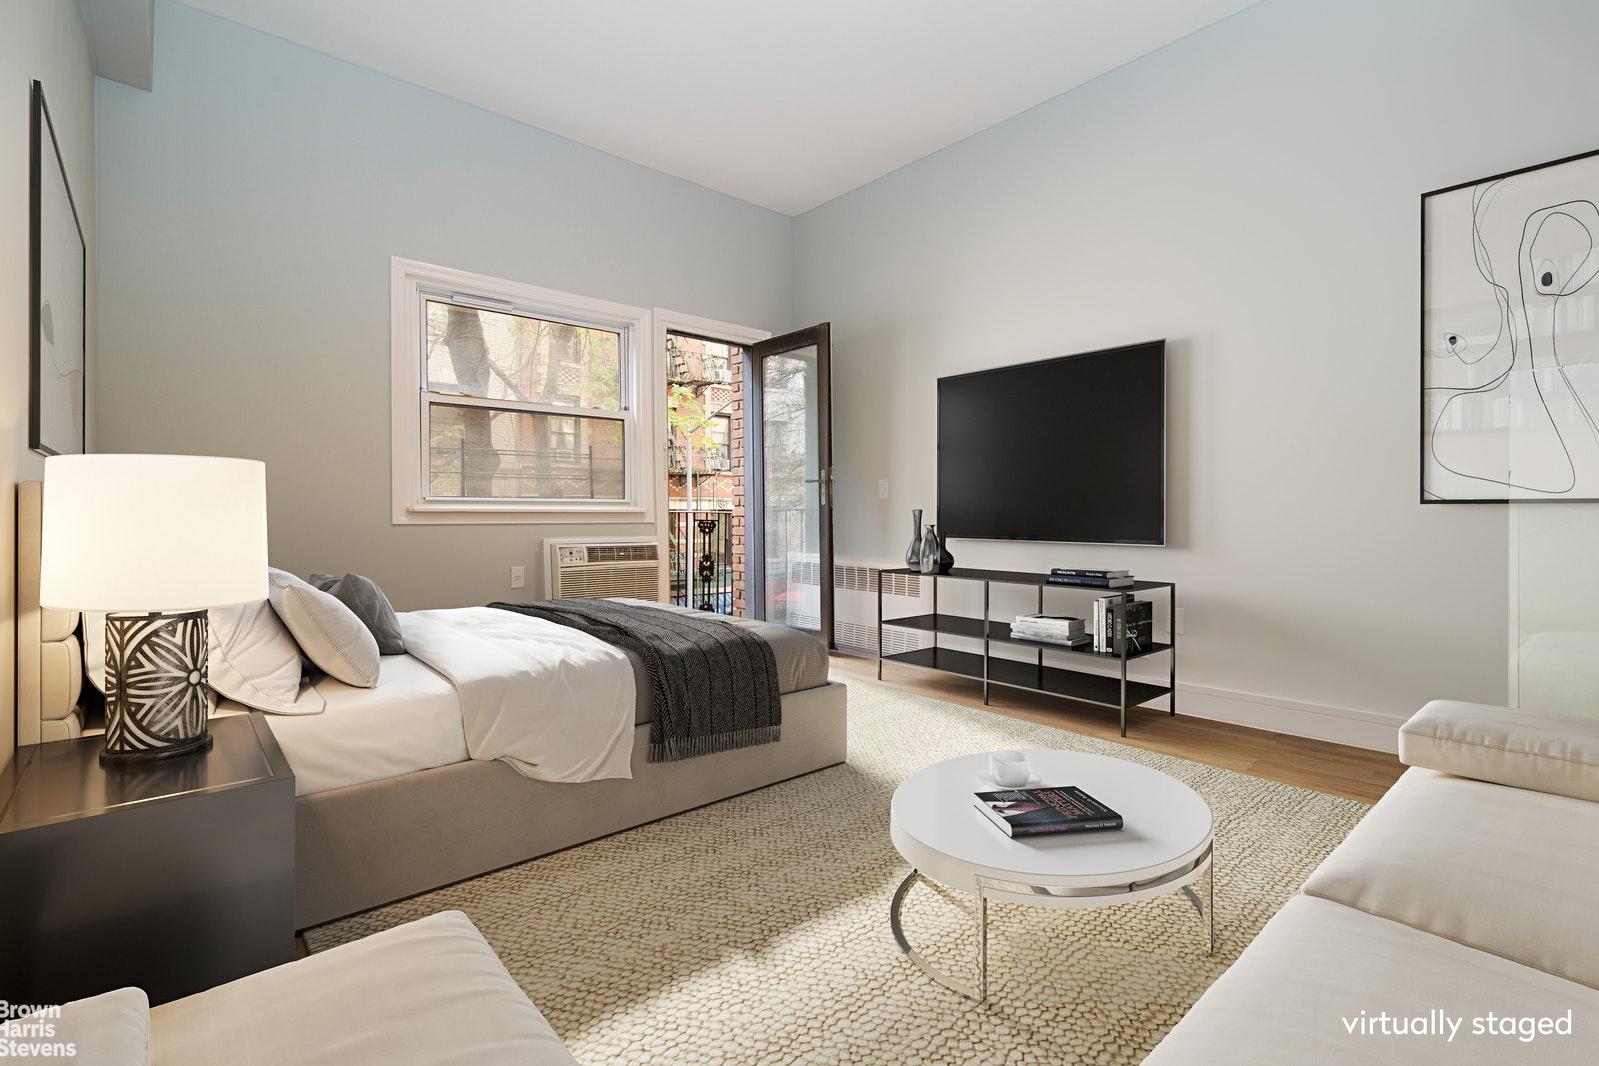 211 THOMPSON STREET 2JK, Greenwich Village, $999,000, Web #: 20565375